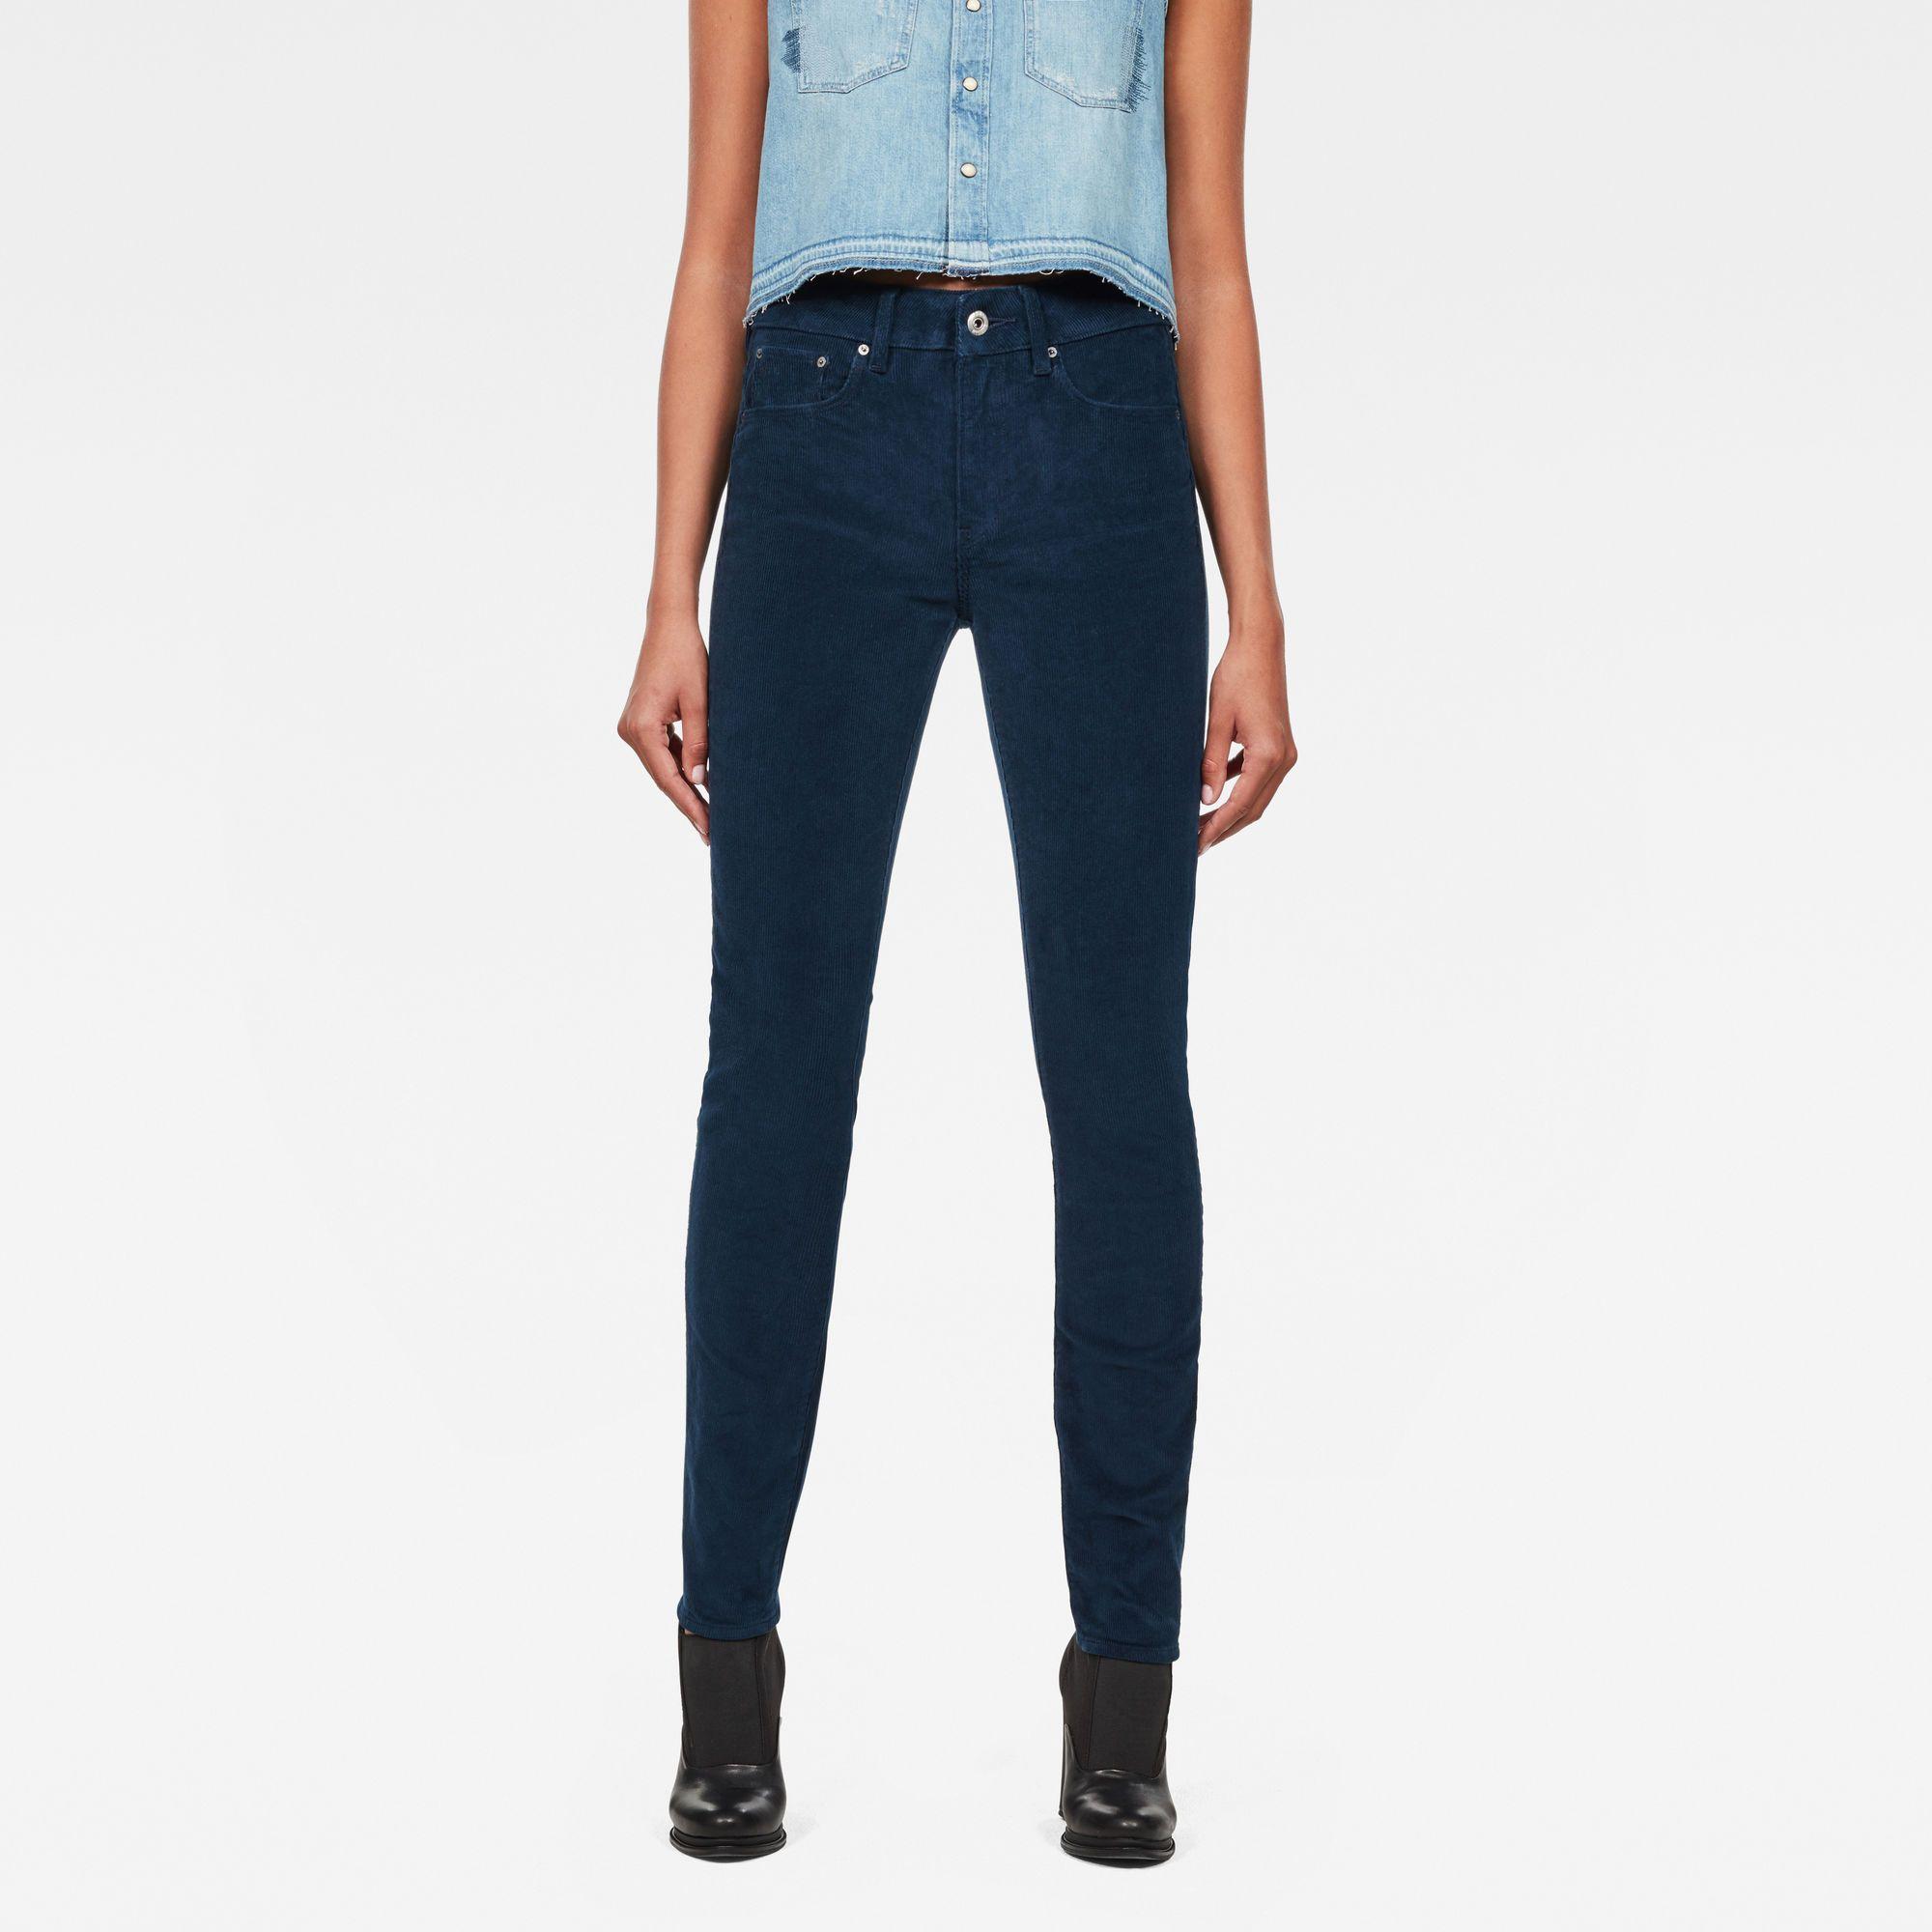 G-Star RAW 3301 High Waist Skinny Jeans